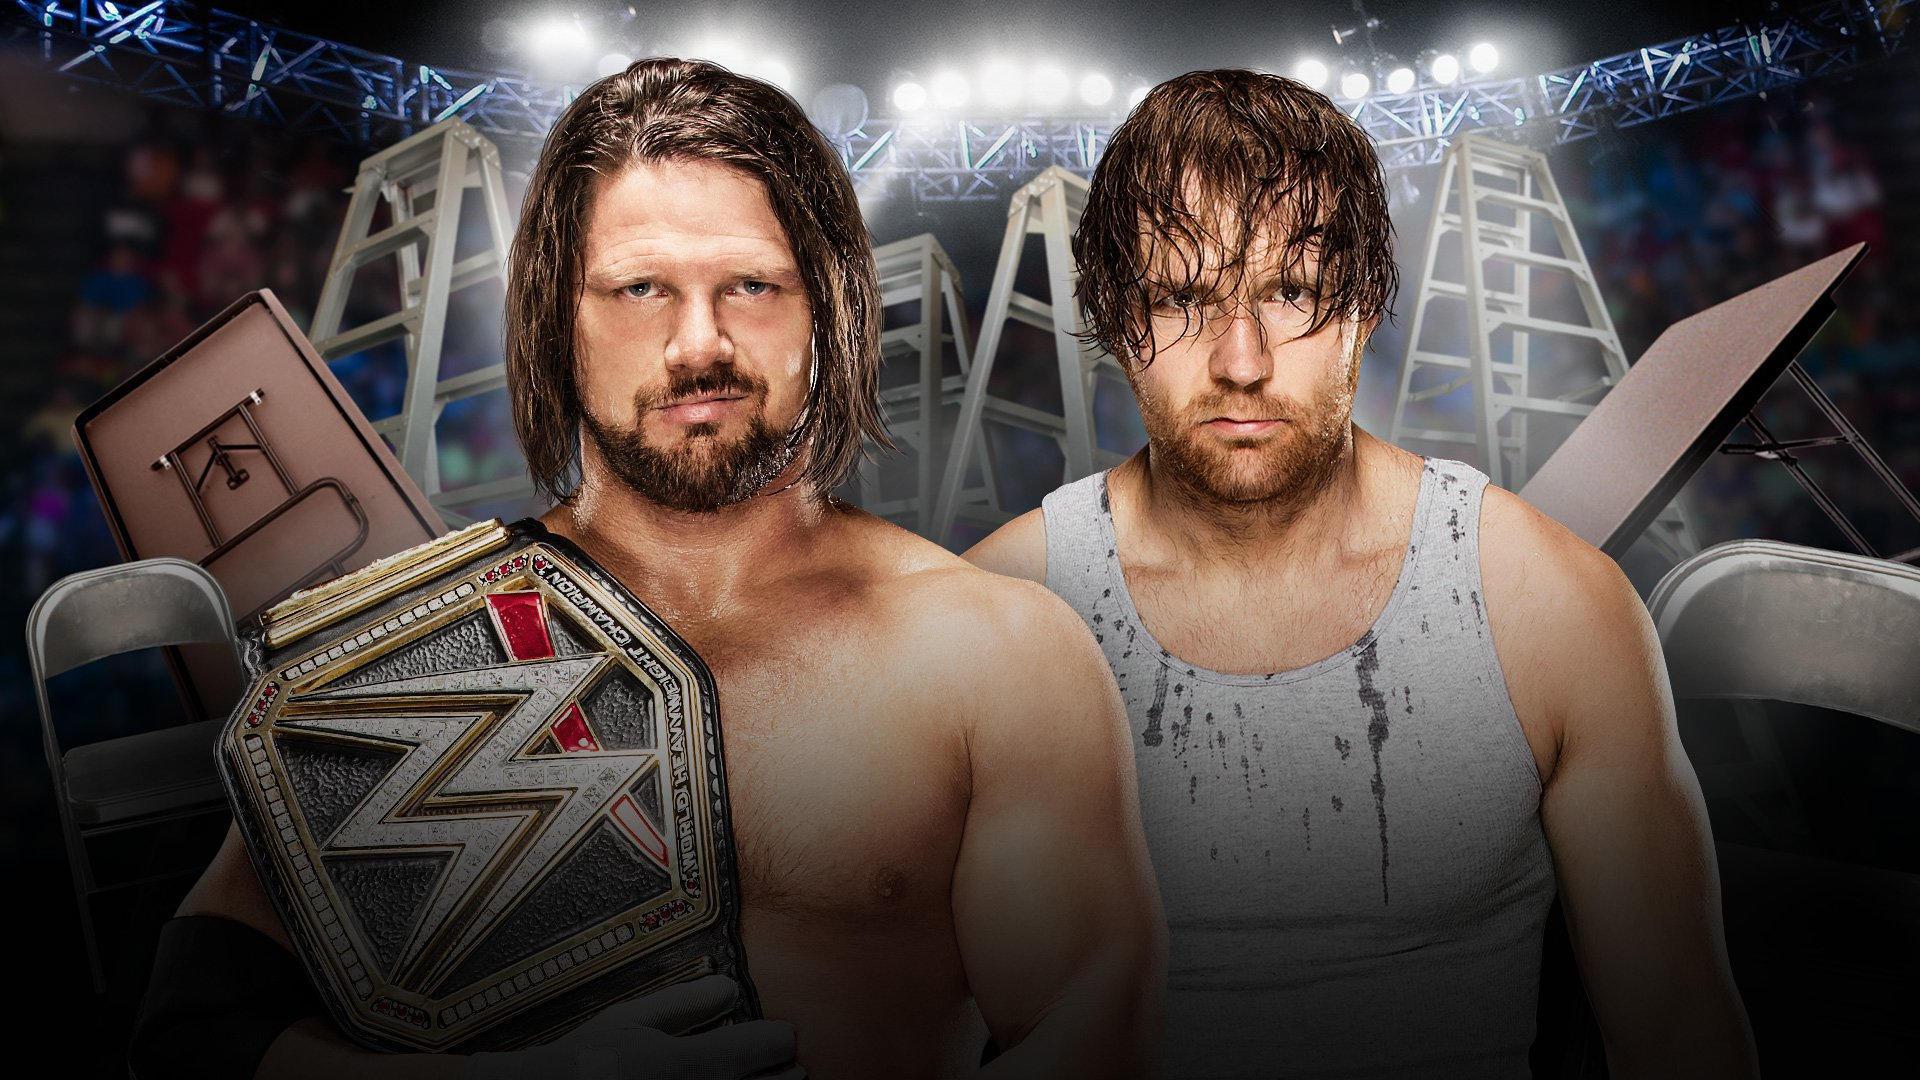 WWE TLC - DECEMBER 4 - DALLAS, TEXAS 20161115_TLC_Match_StylesAmbrose--786cdbdf6544931d235f19611cc5b586